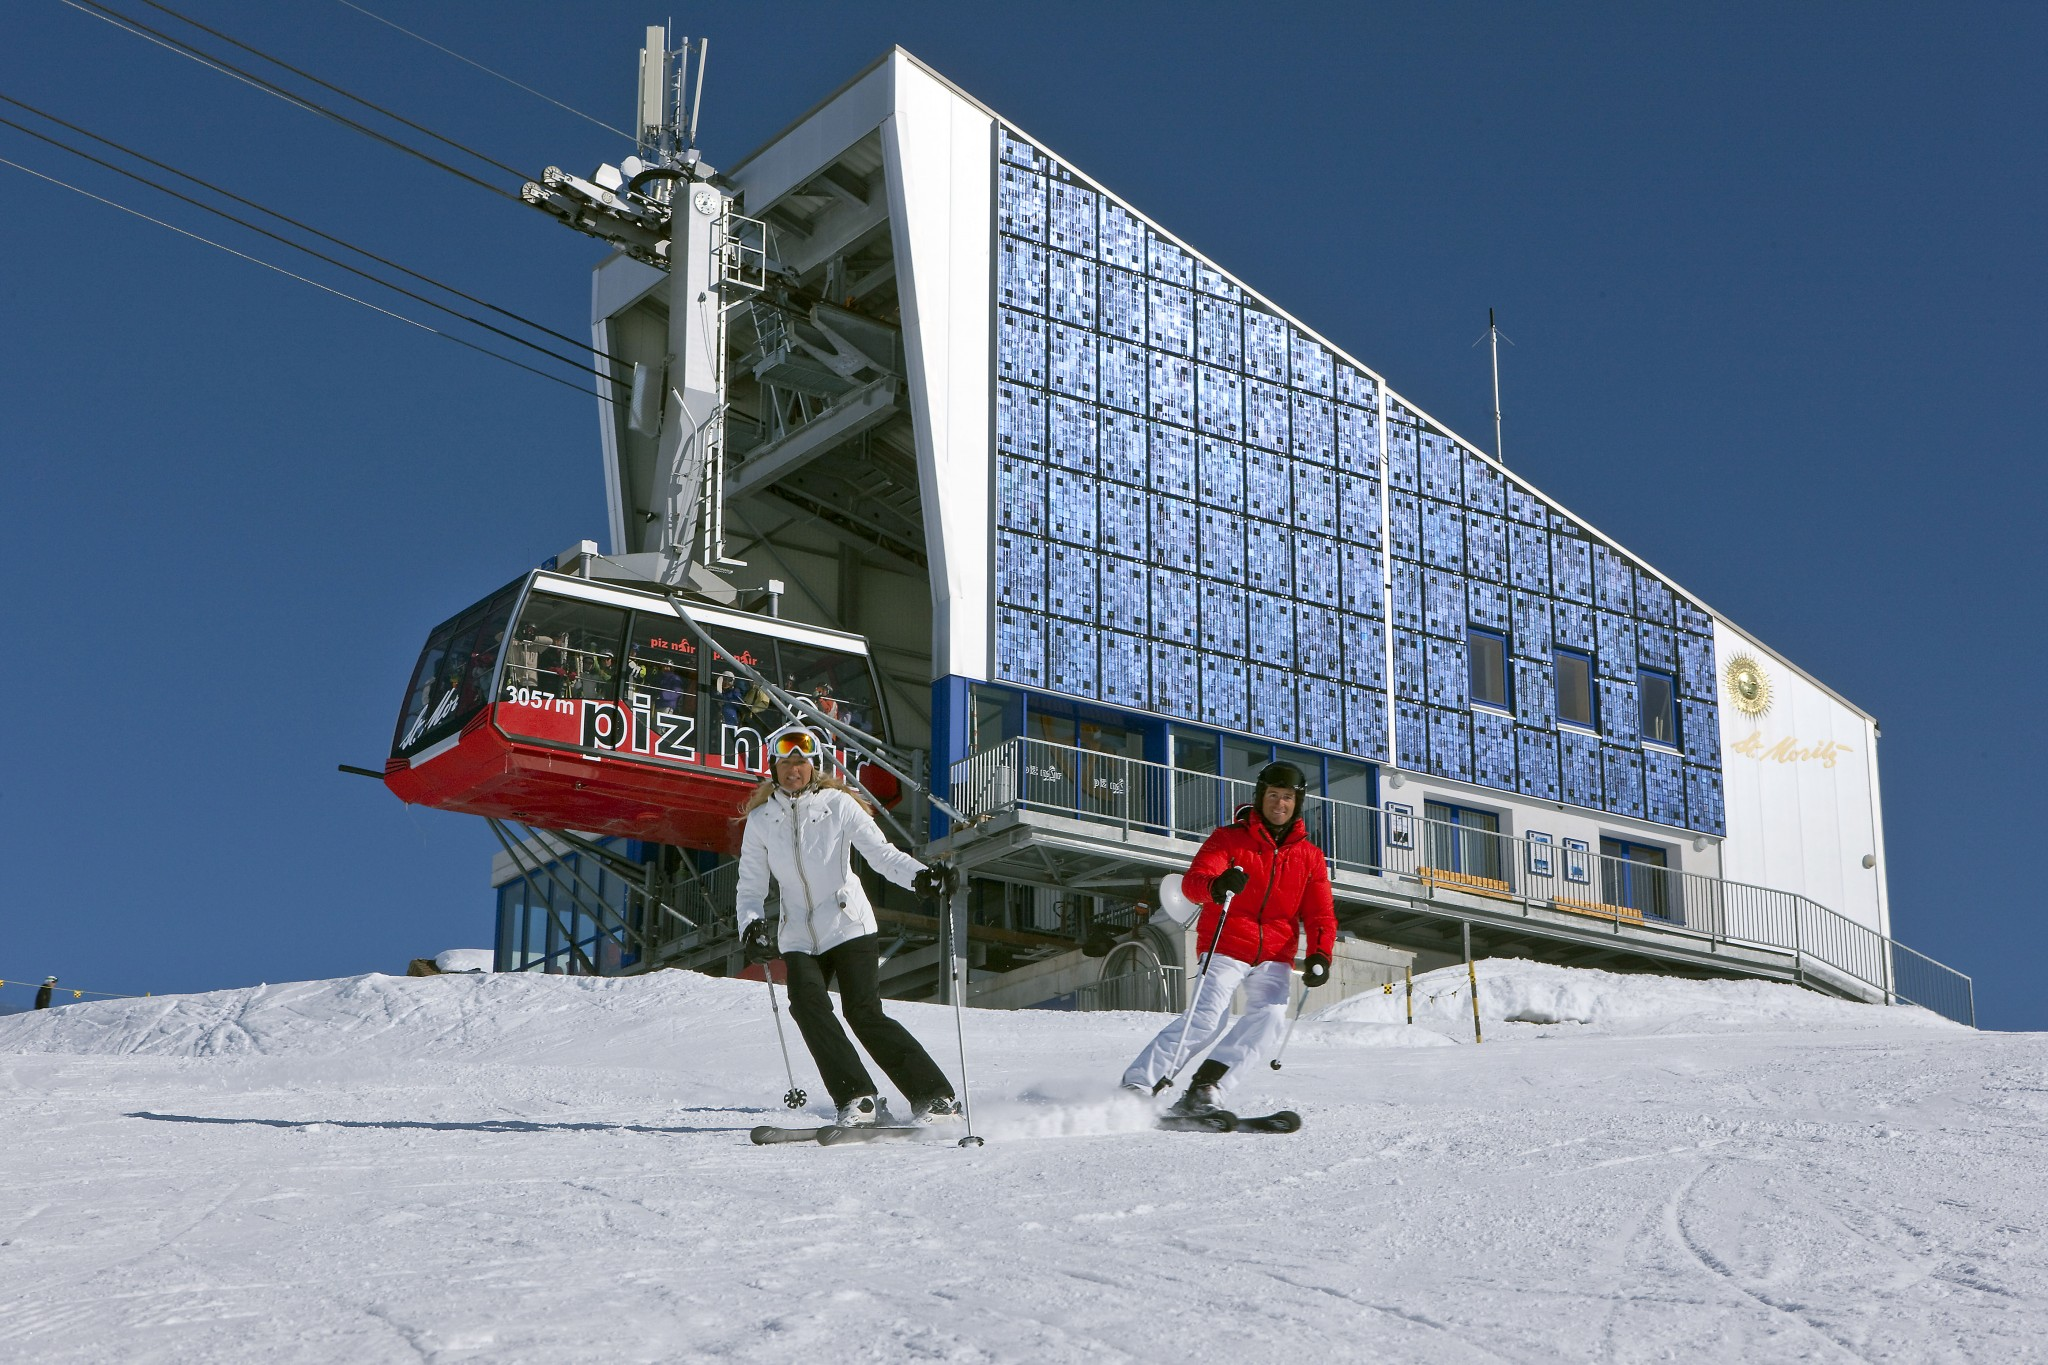 Earlier Opening And New Ski Safari at St MoritzCREDITSwissImageChristof Sonderegger